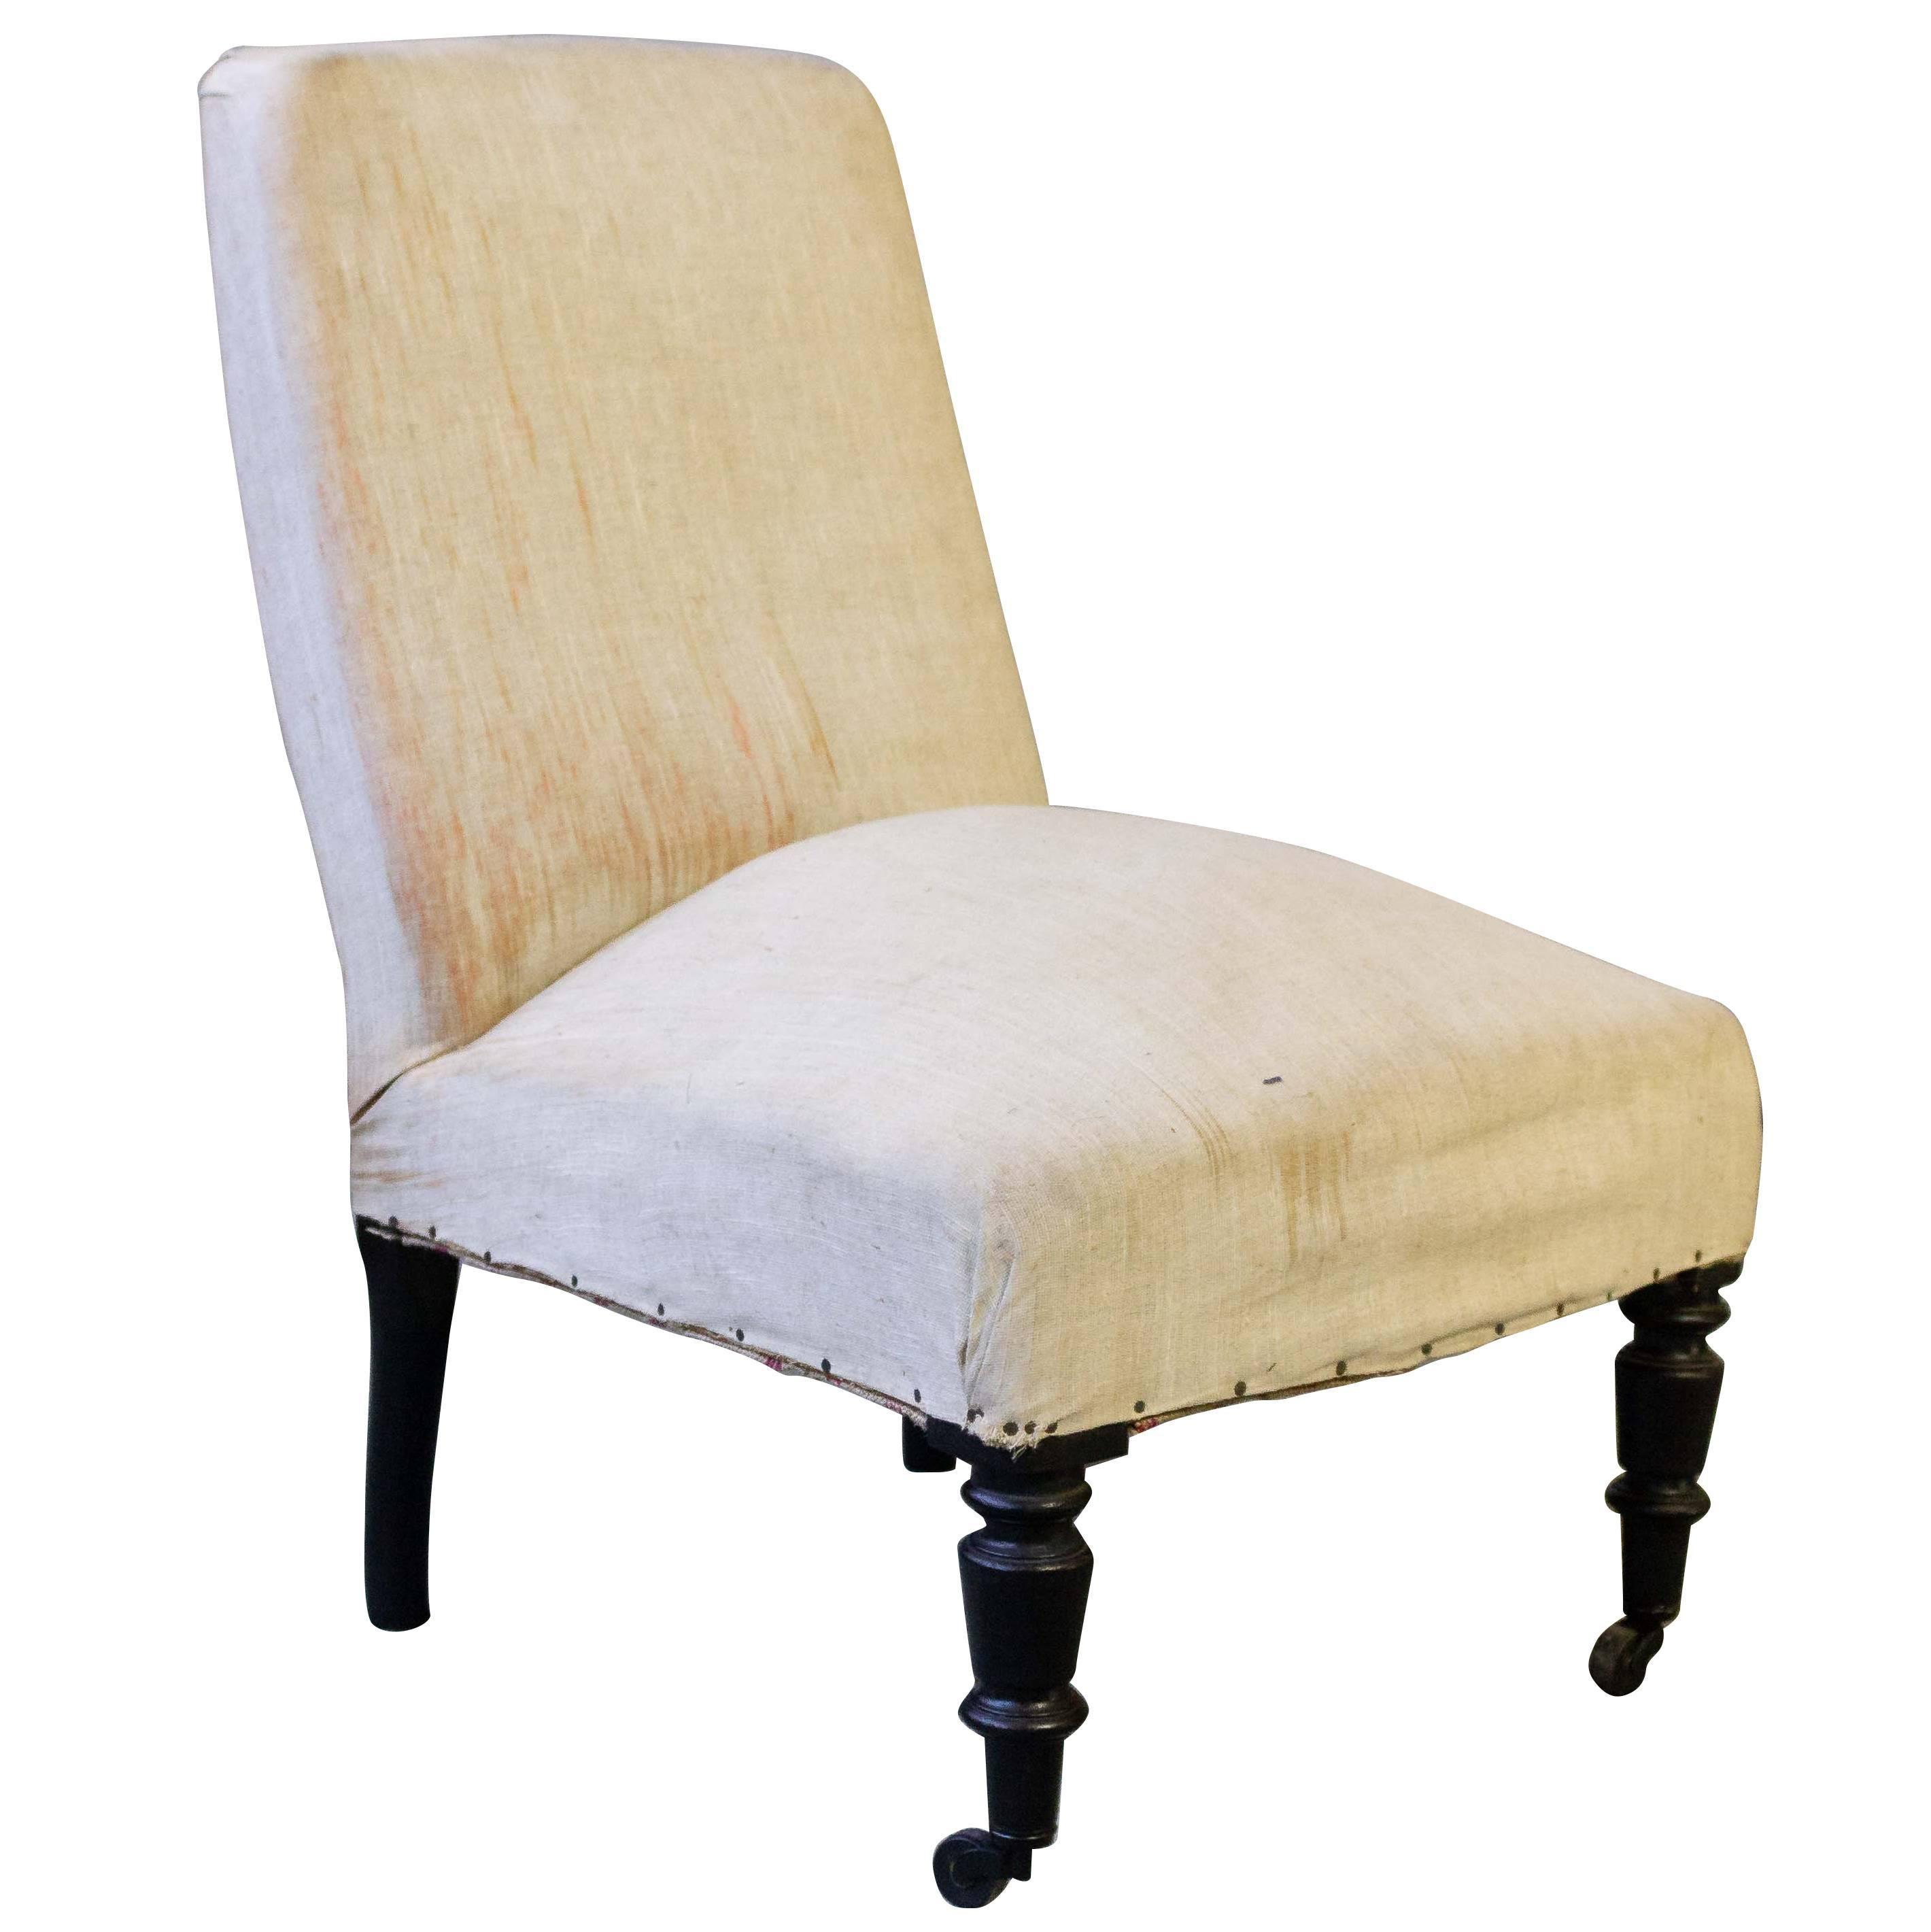 French 19th Century Slipper Chair